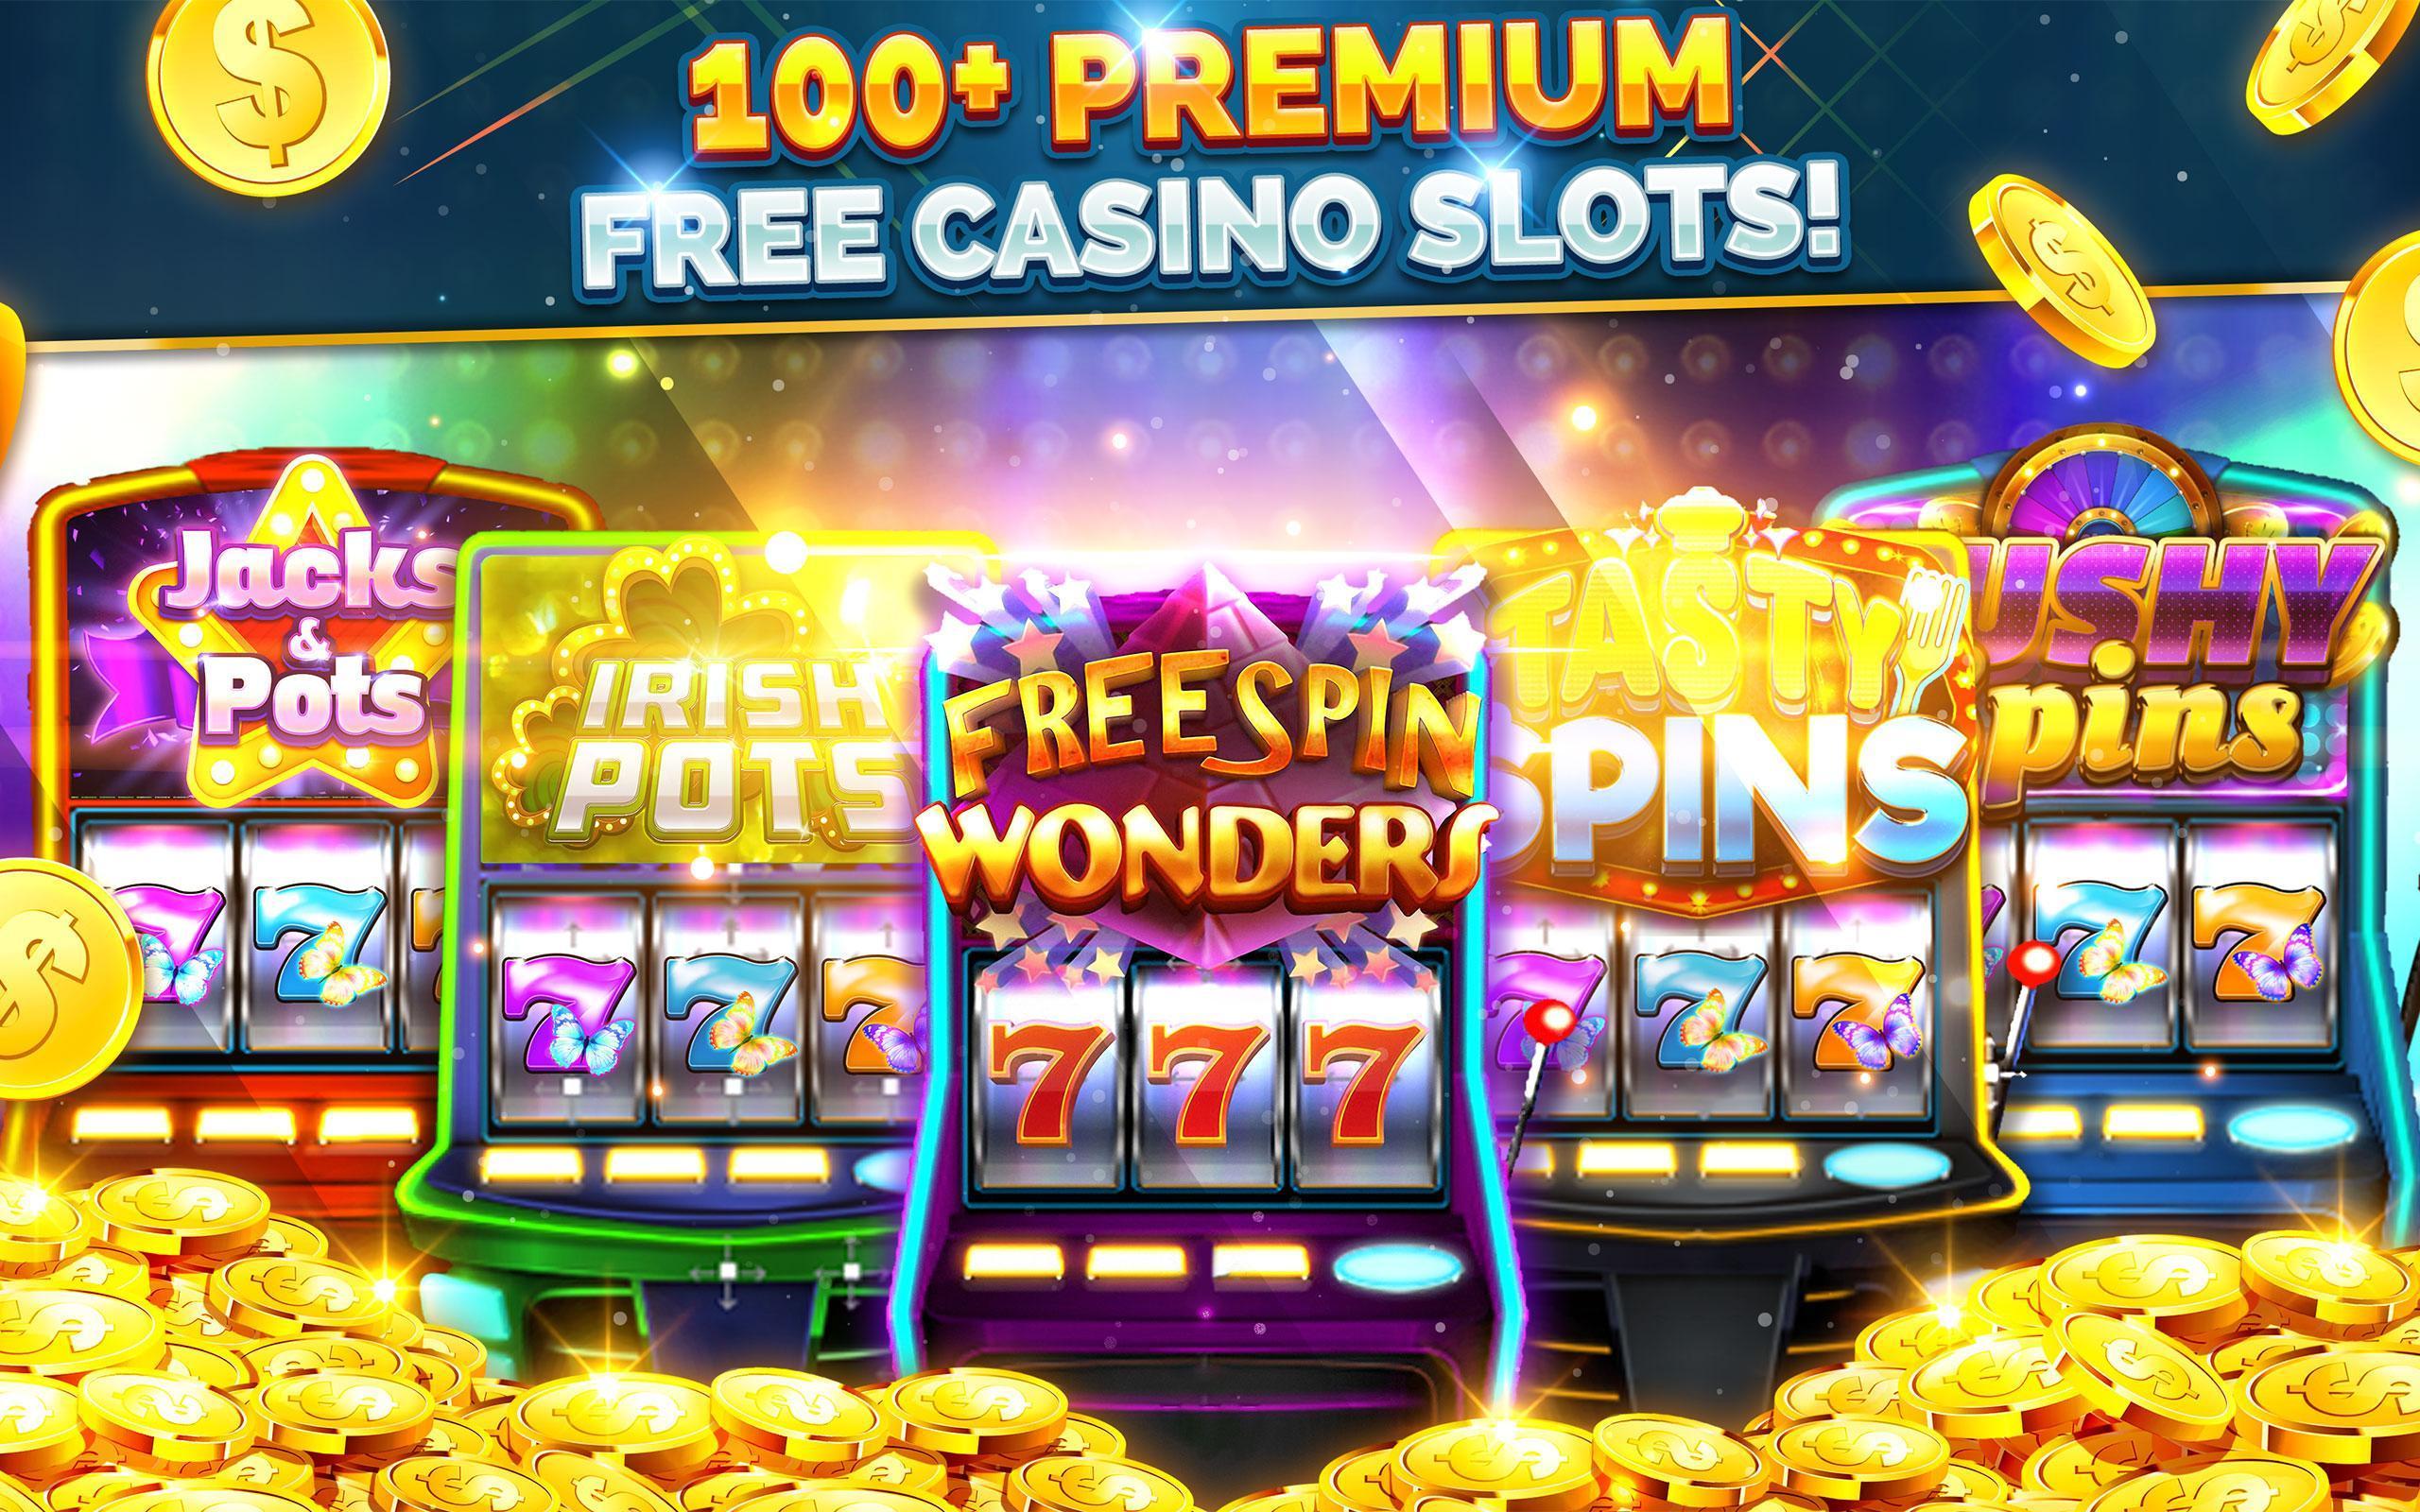 Casino slot games downloads babel slot machine for sale